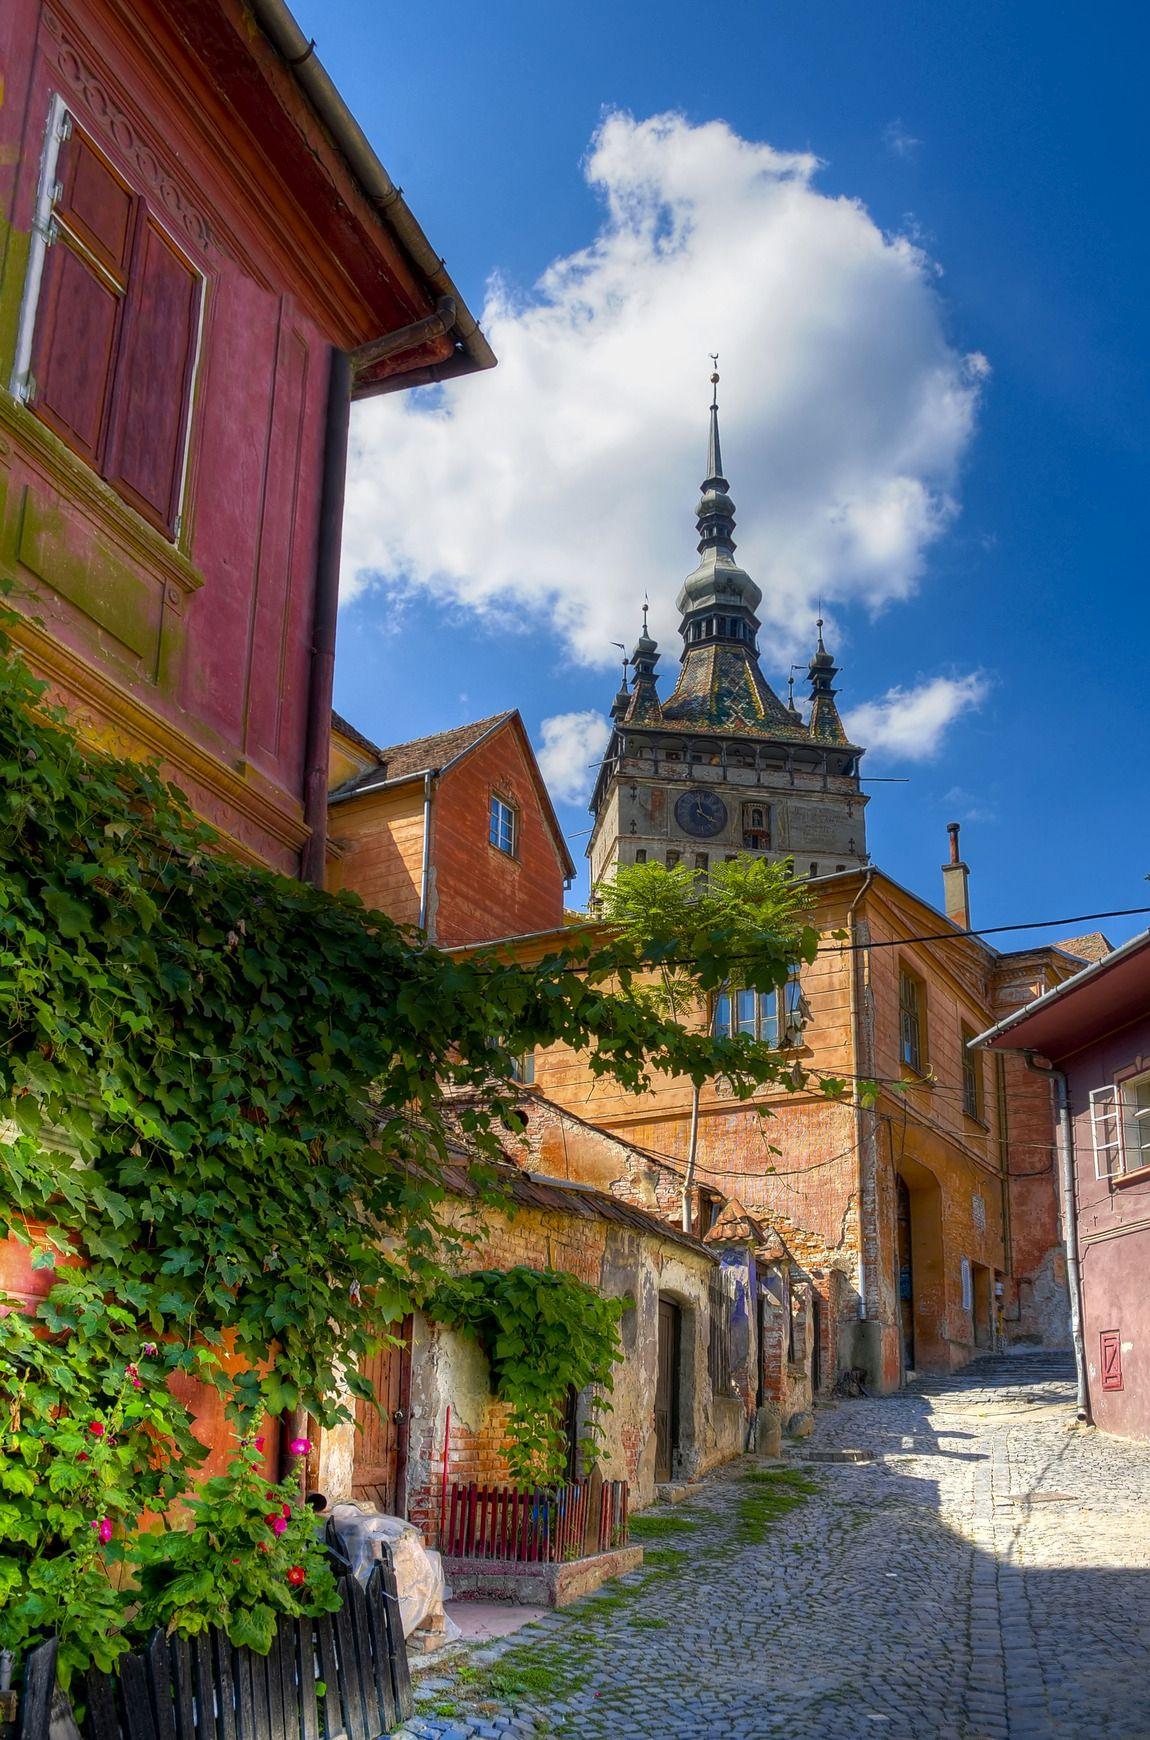 Medieval City in Transylvania